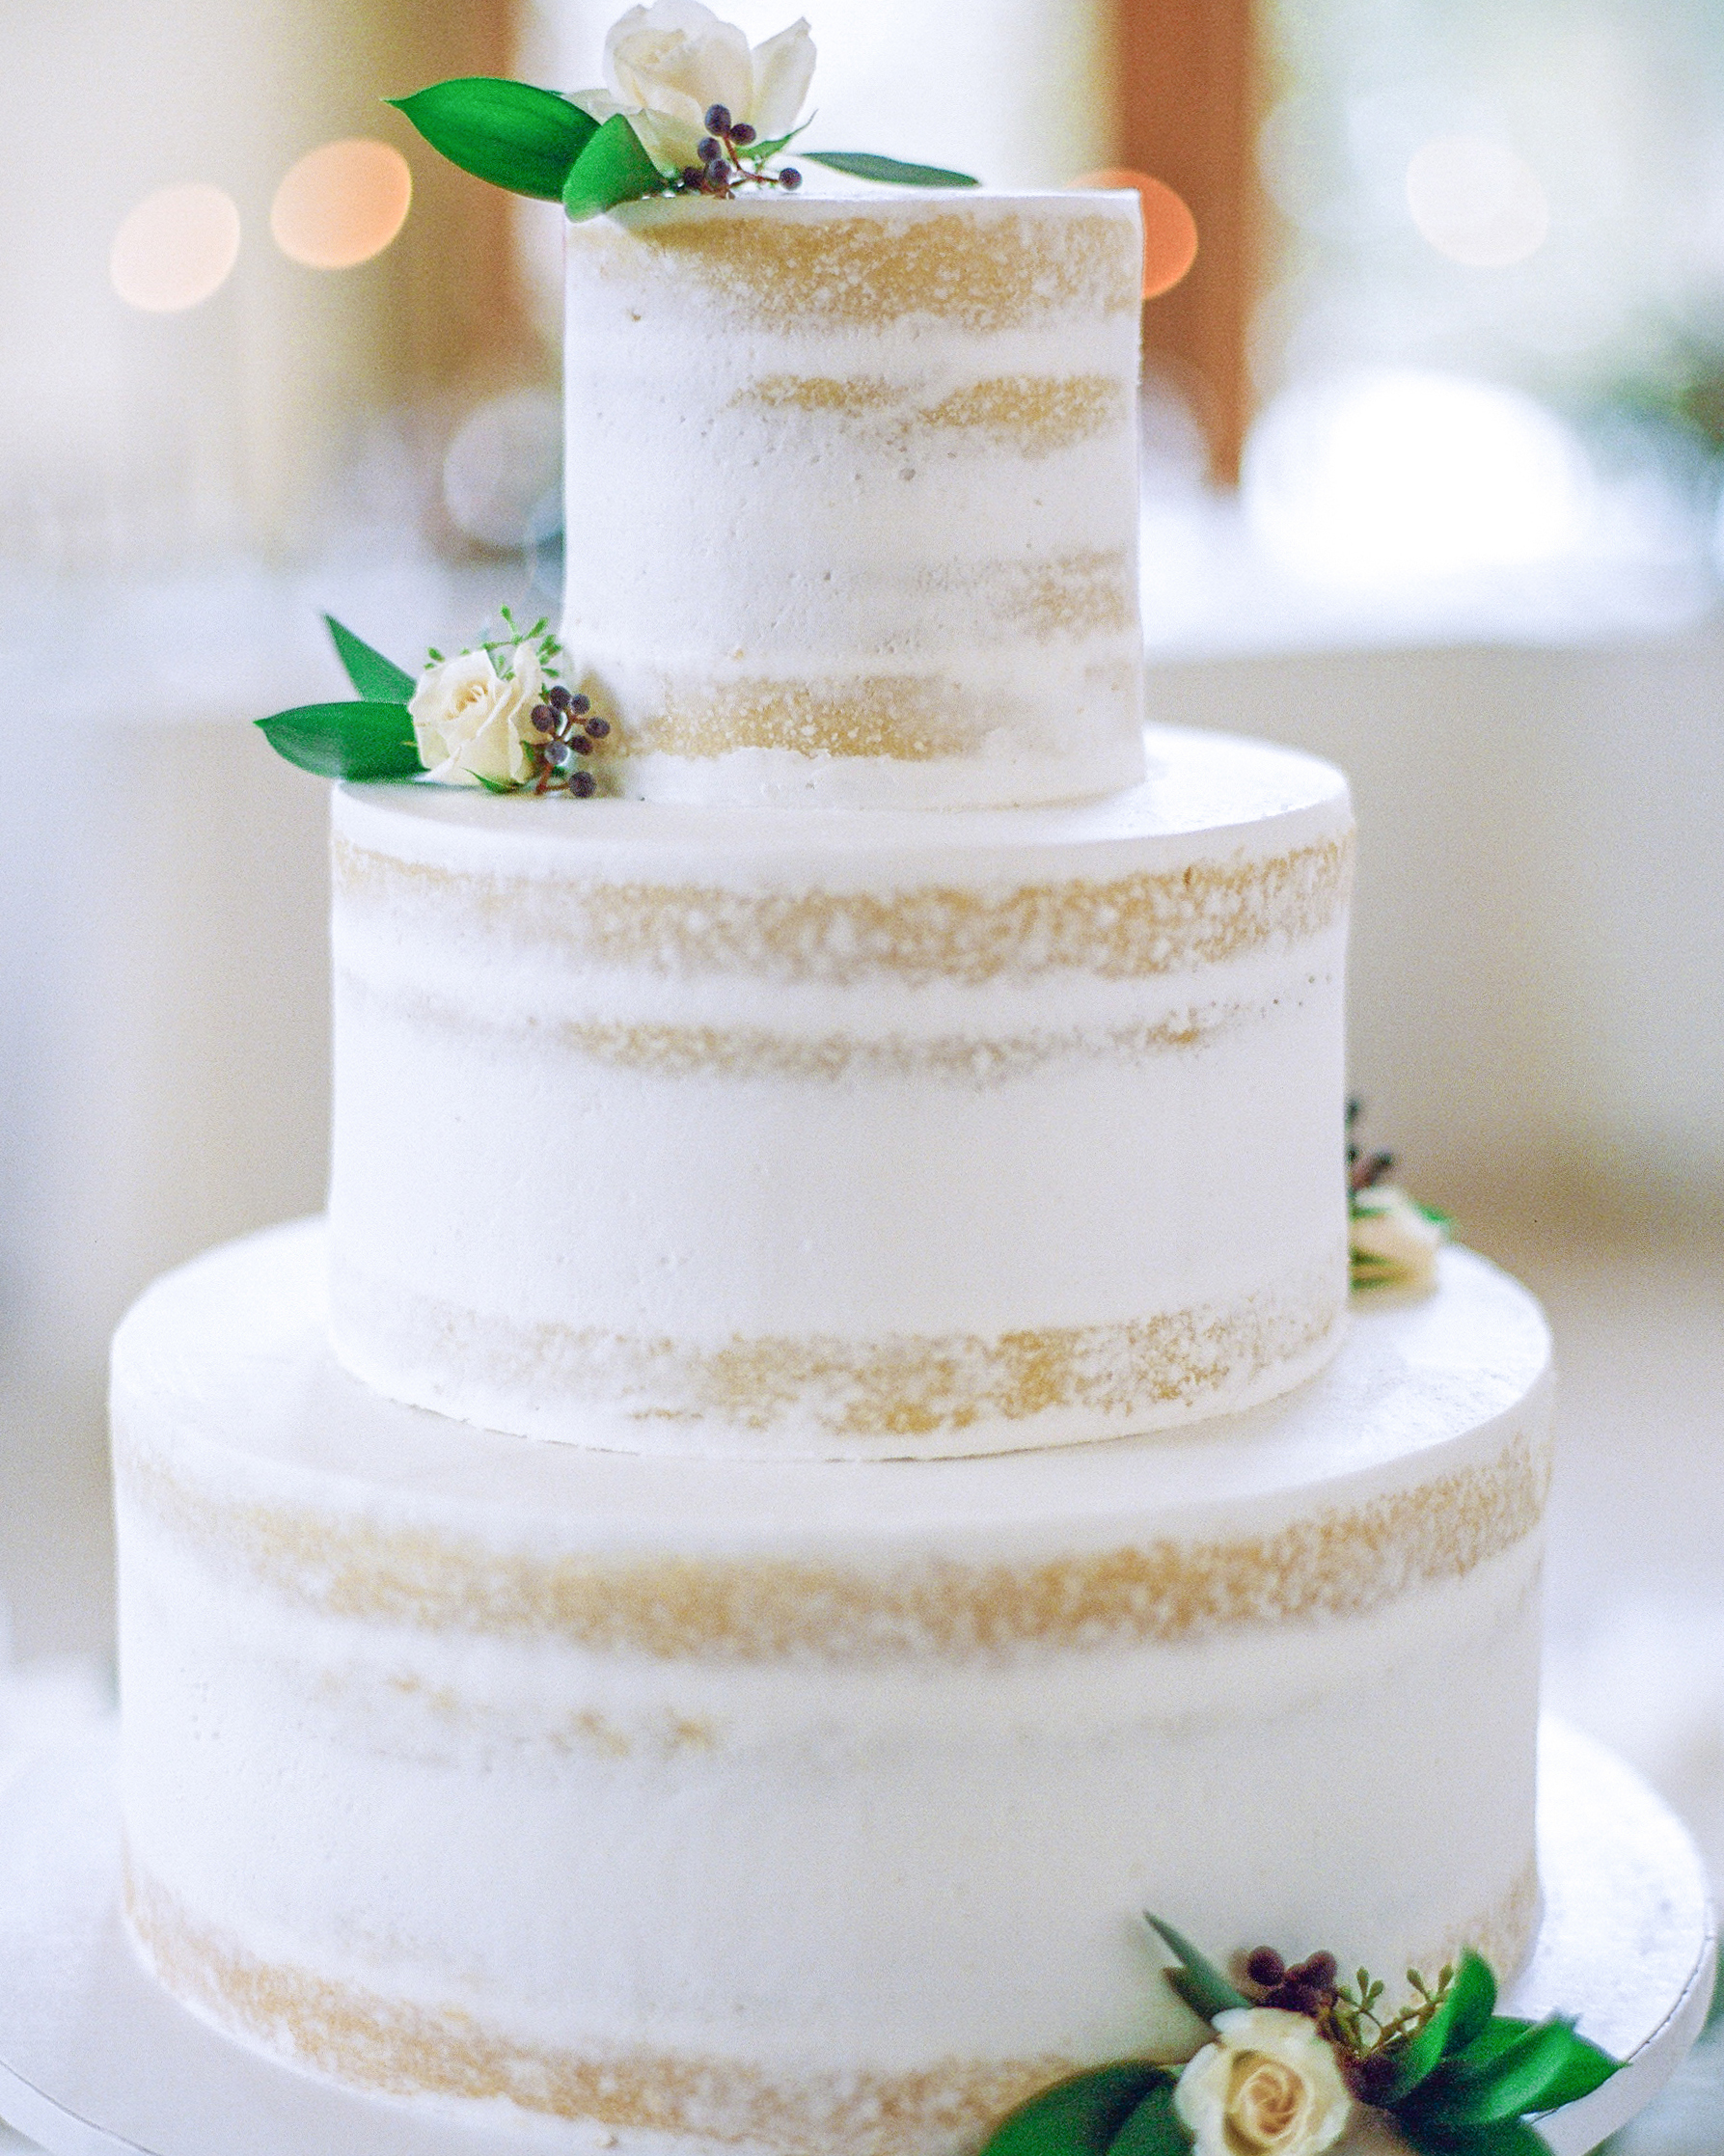 kendall-grant-wedding-cake-042-s112328-1215.jpg